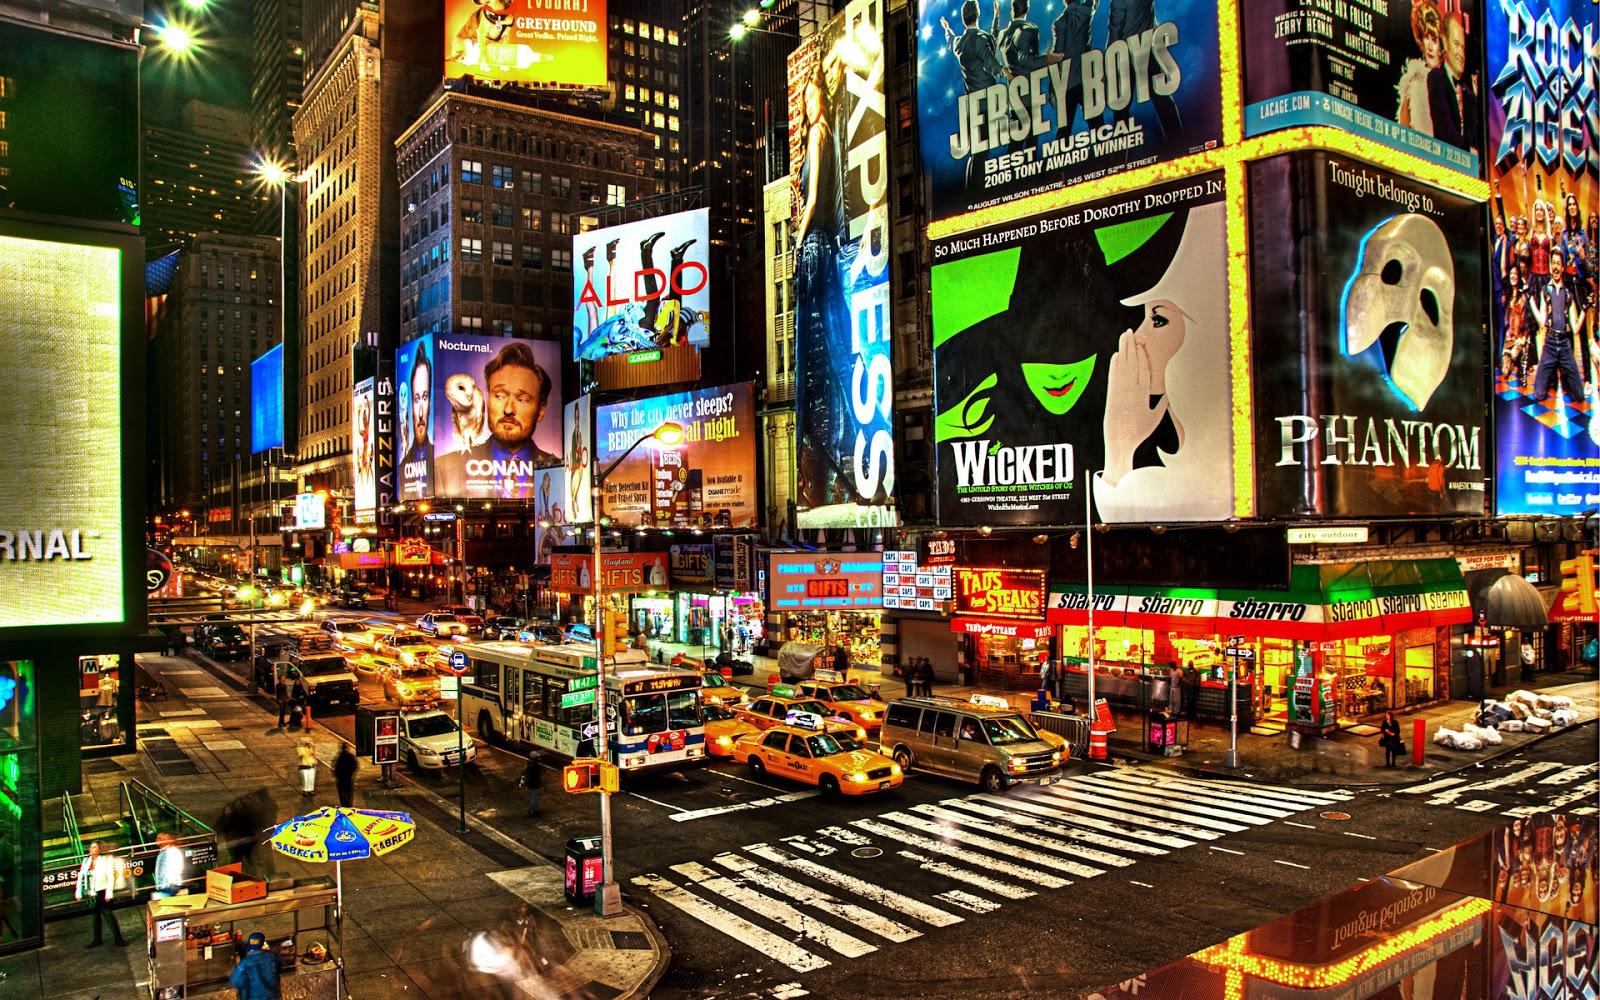 http://2.bp.blogspot.com/-evq36vGKft4/T7fDP2j_2iI/AAAAAAAAI7c/pSXYIWapKh0/s1600/Bbroadway+Wallpaper+city,+night,+desktop.jpg